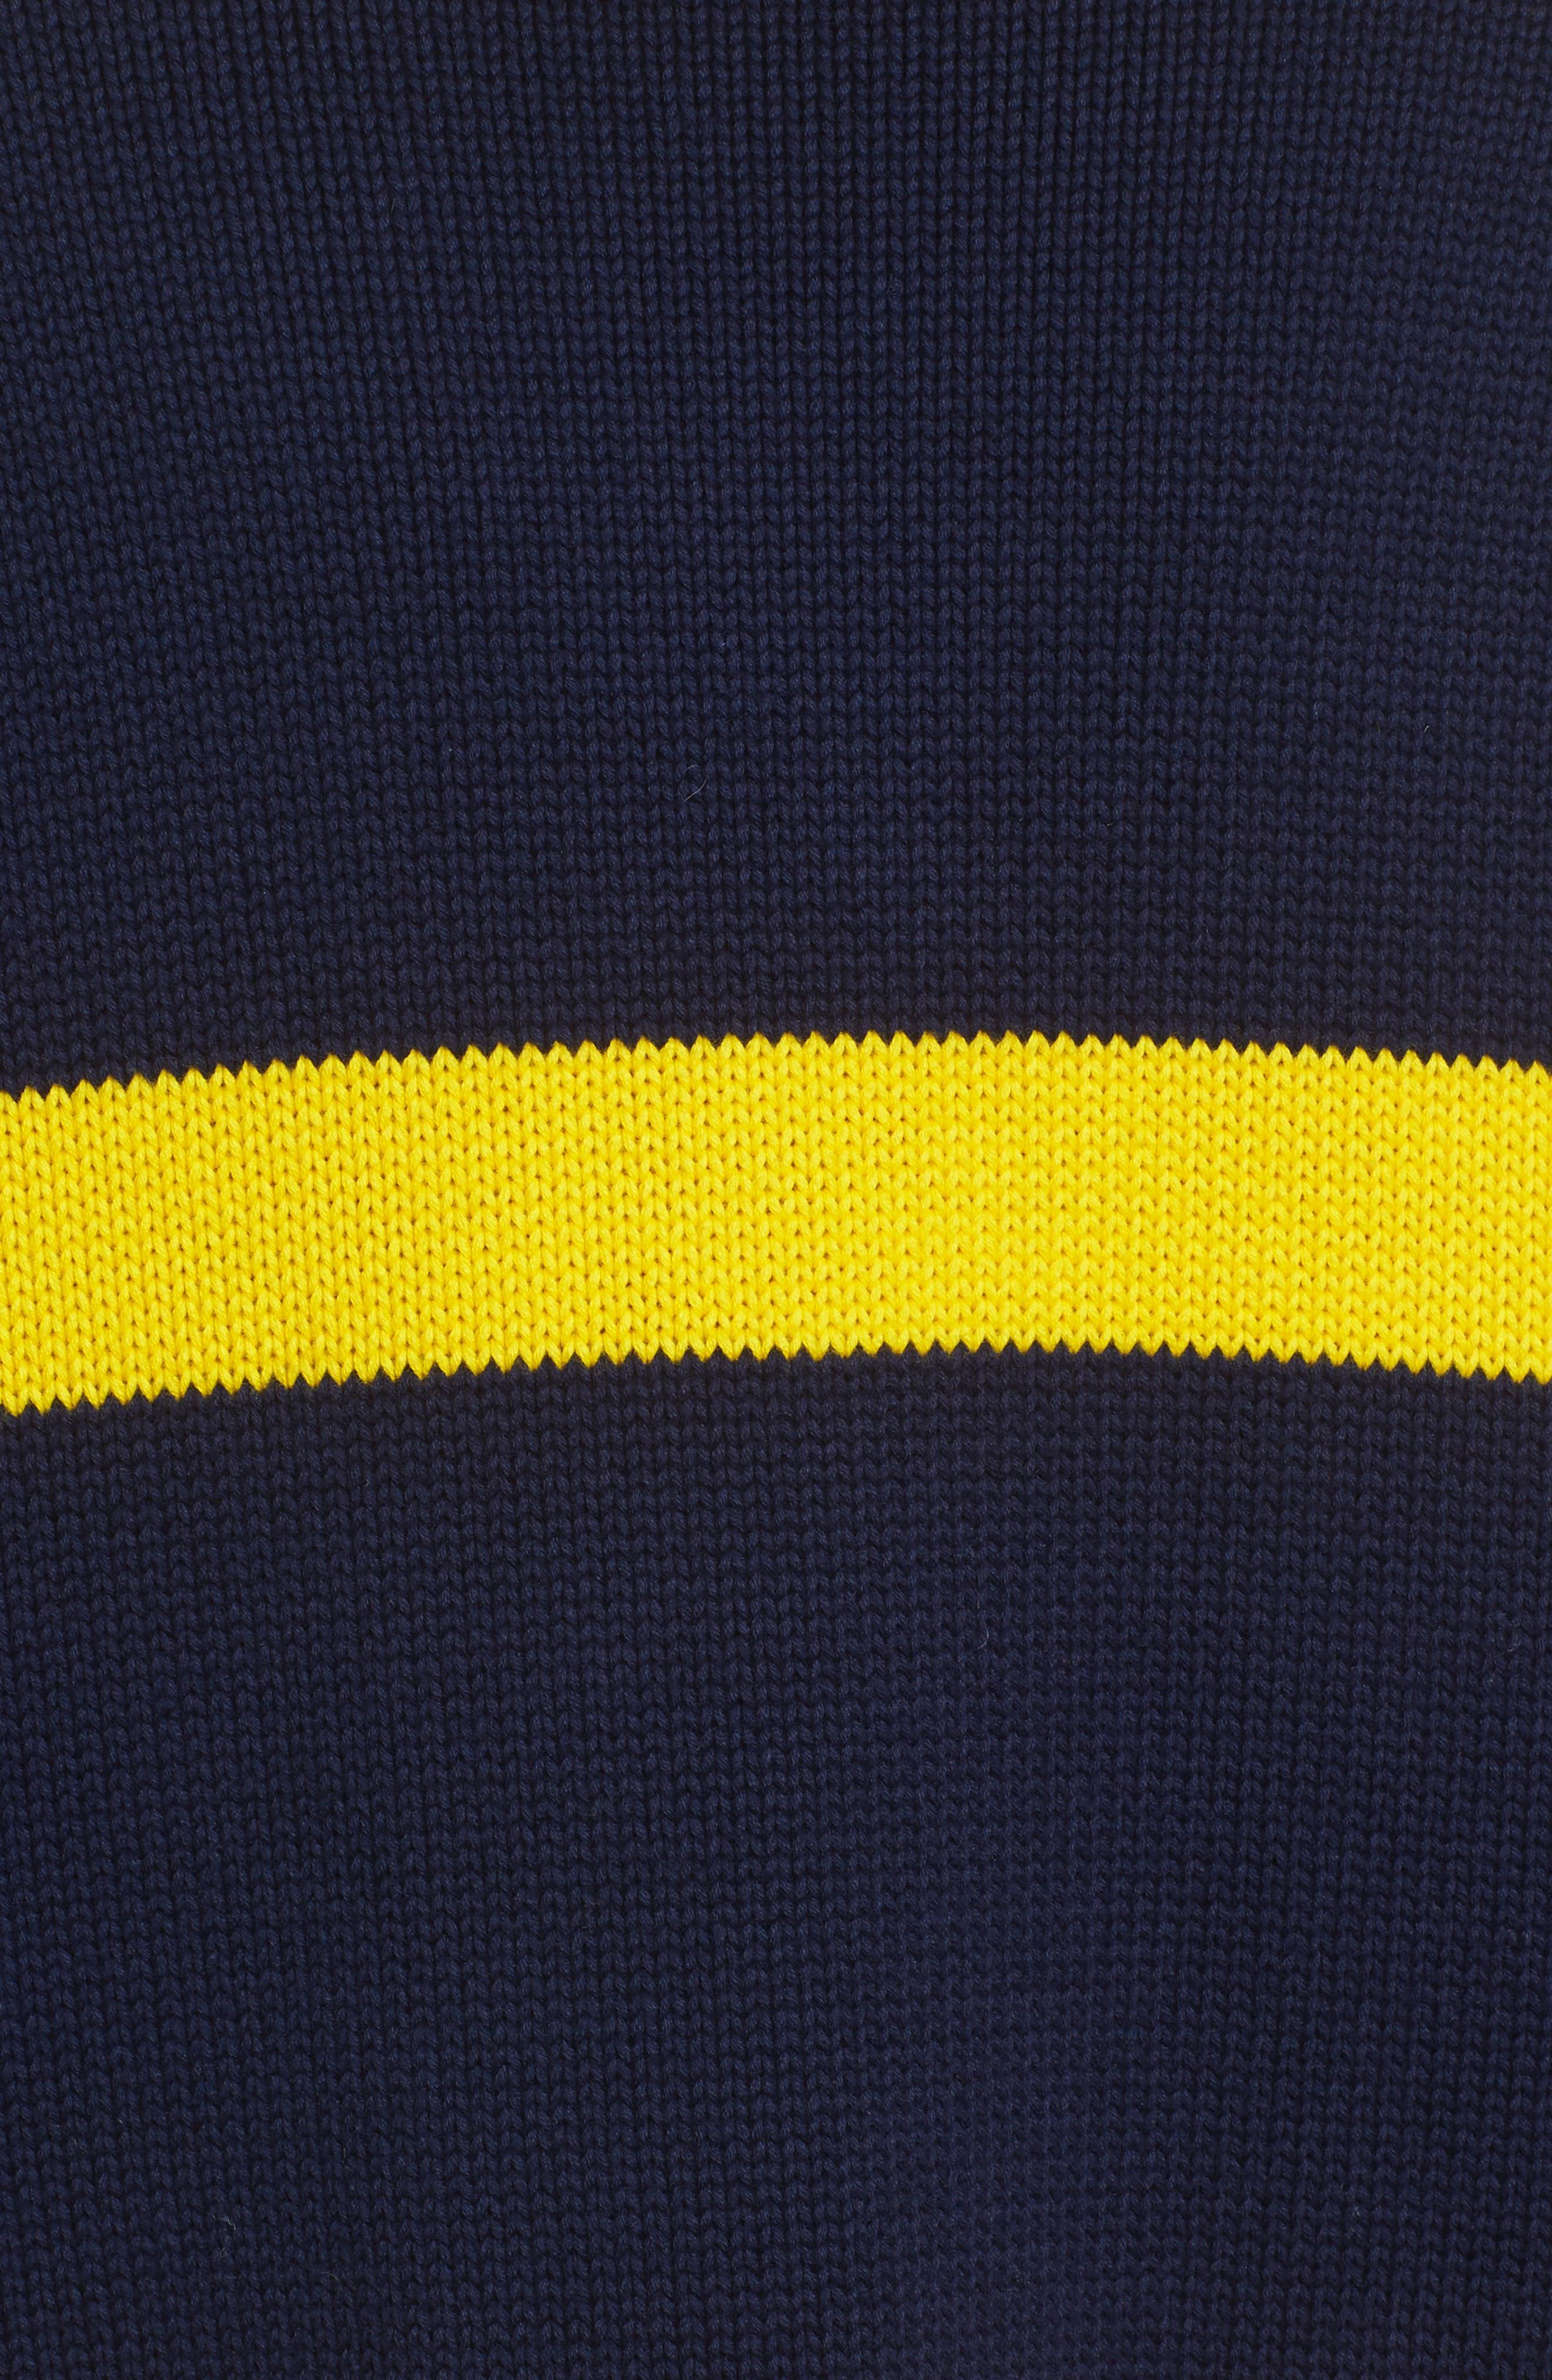 PUMA by Rihanna Longline Stripe Sweater,                             Alternate thumbnail 5, color,                             400